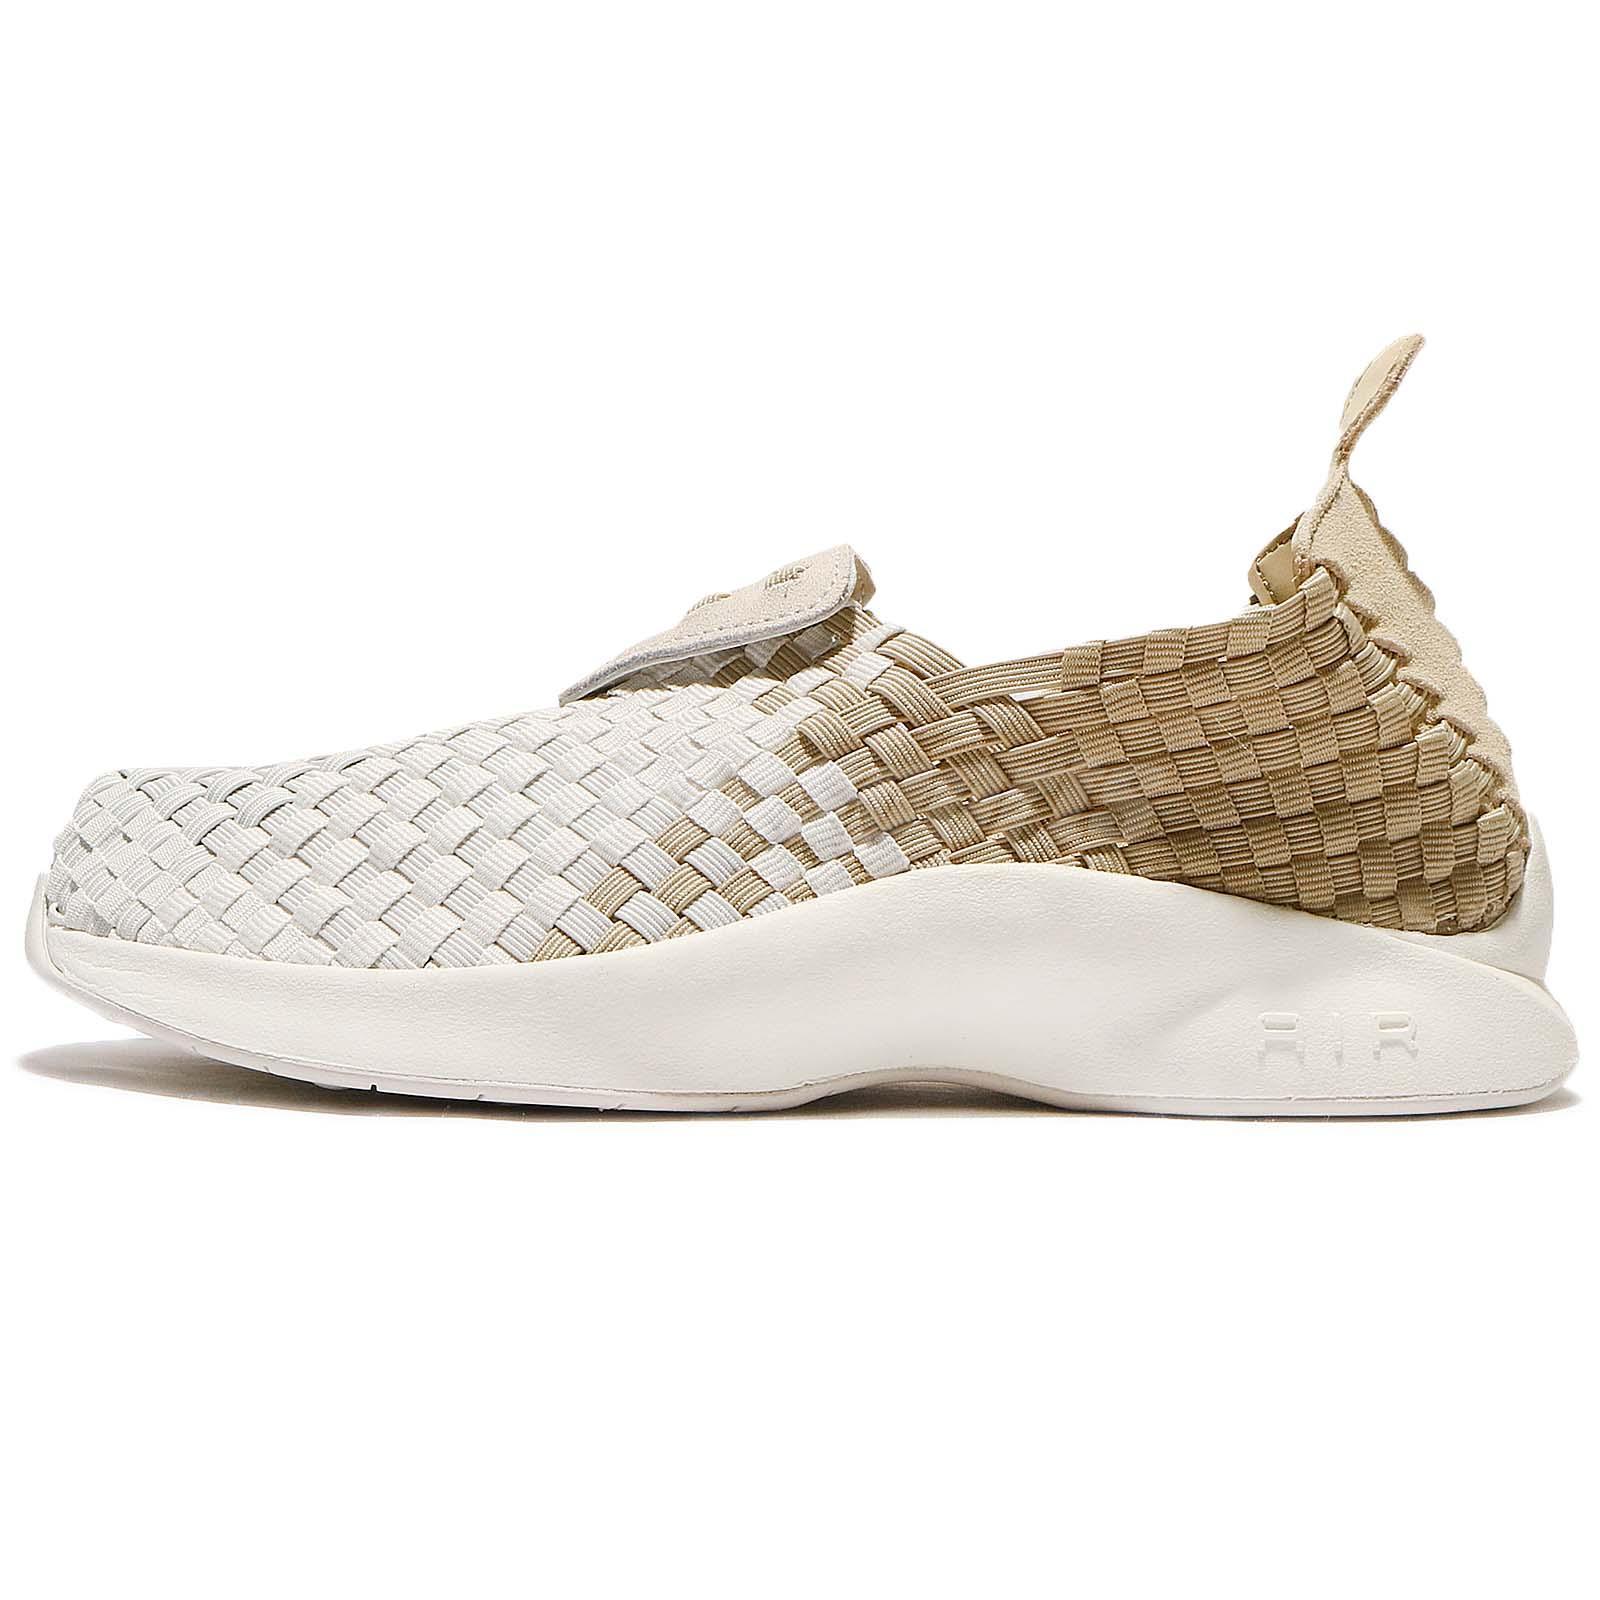 hot sale online 58e20 19852 Nike Wmns Air Woven Linen Light Bone Sail Women Casual Slip On Shoes 302350 -200